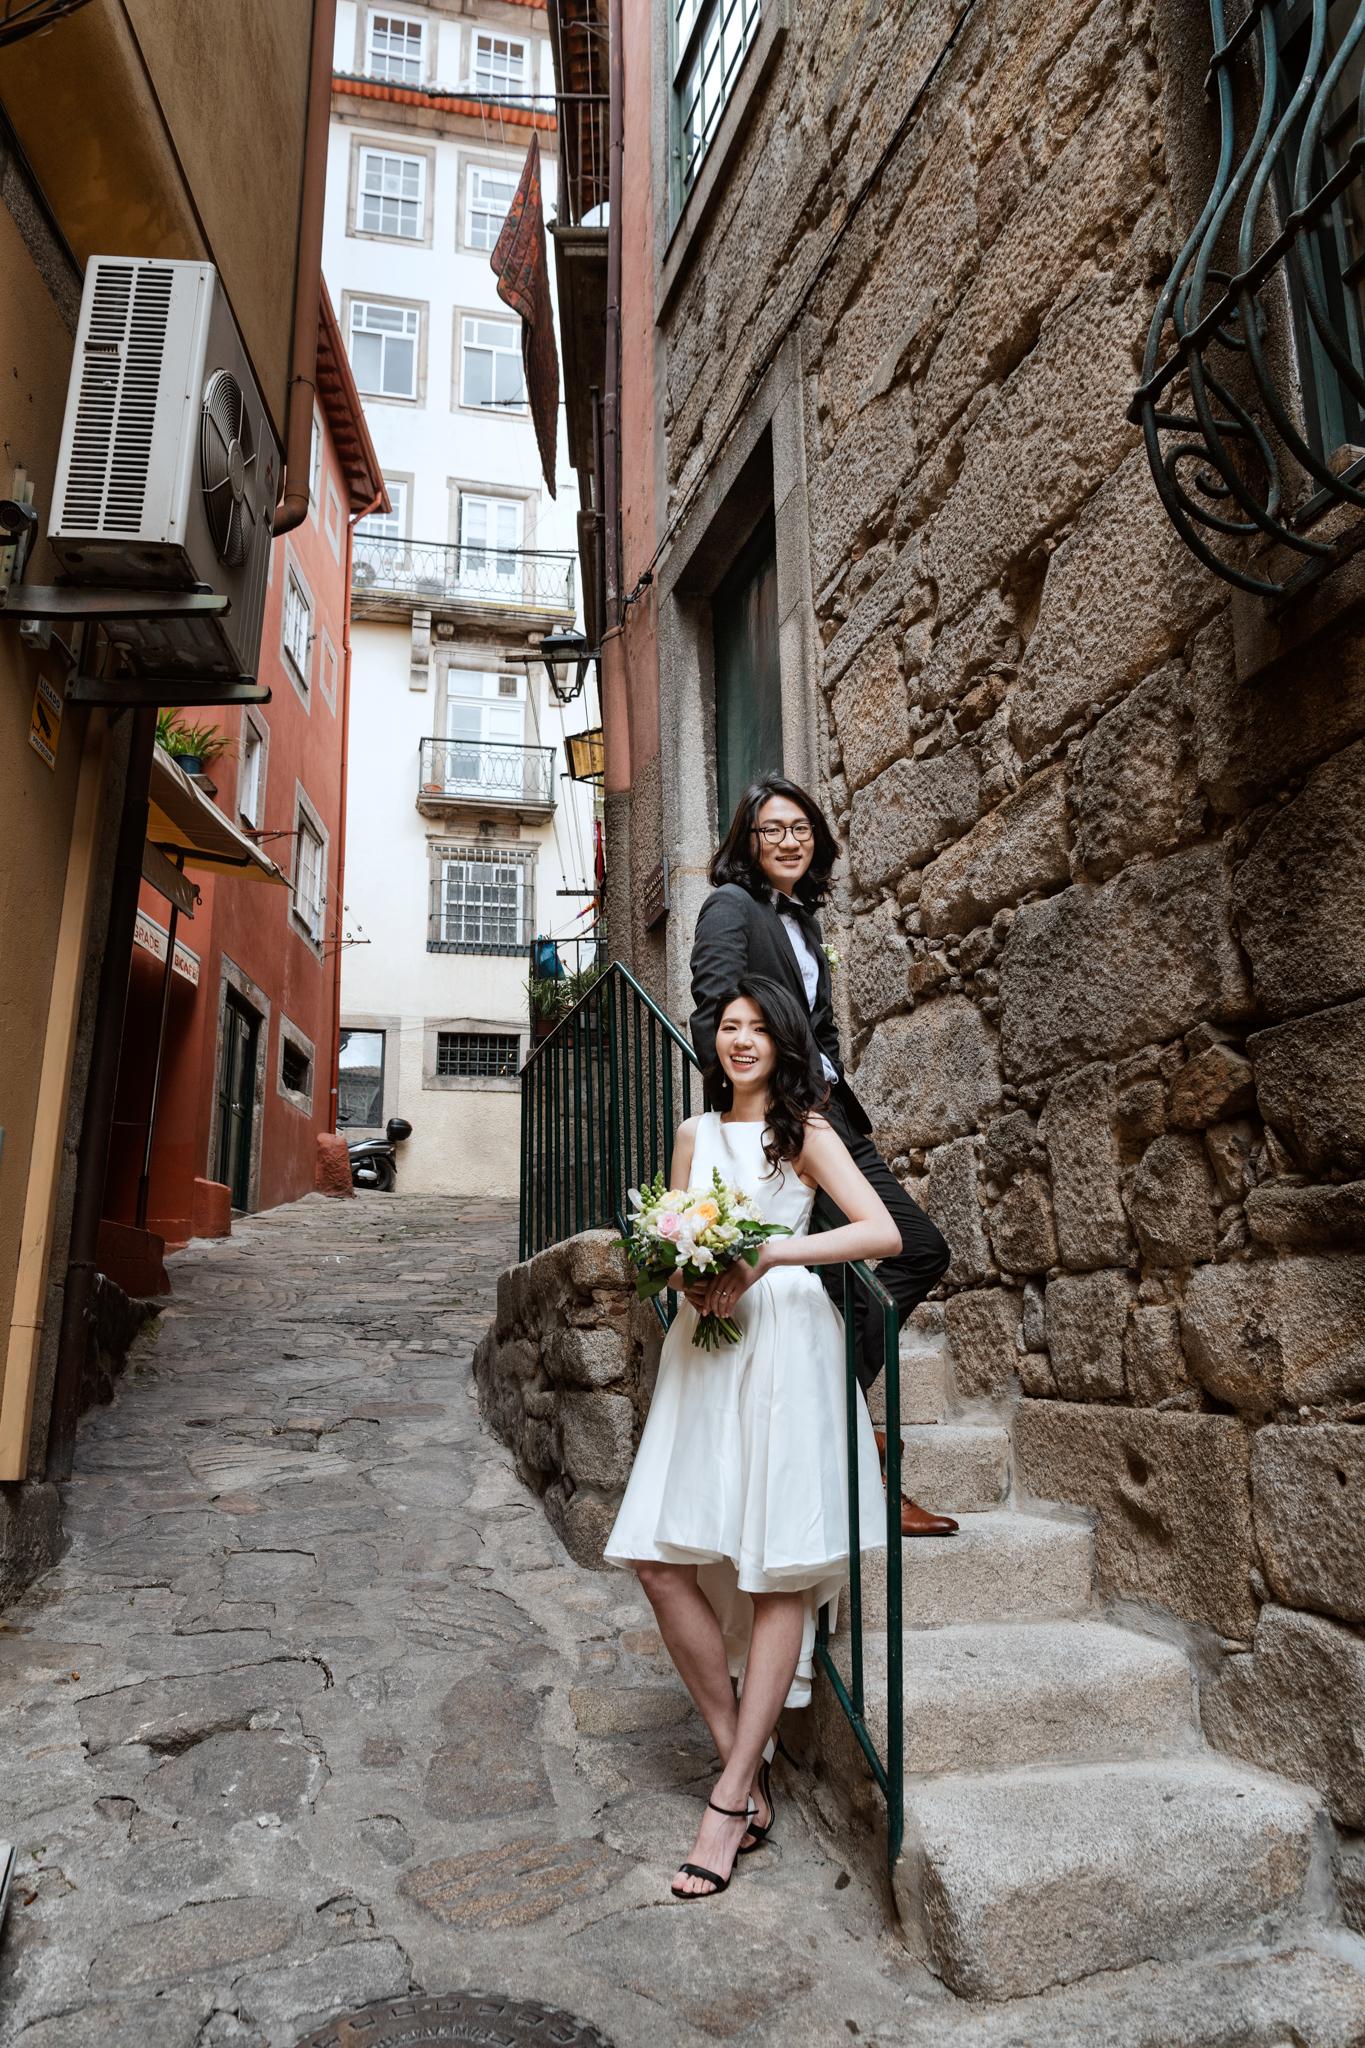 東法, 海外婚紗, 葡萄牙婚紗, Donfer, Donfer Photography, Porto, 波多